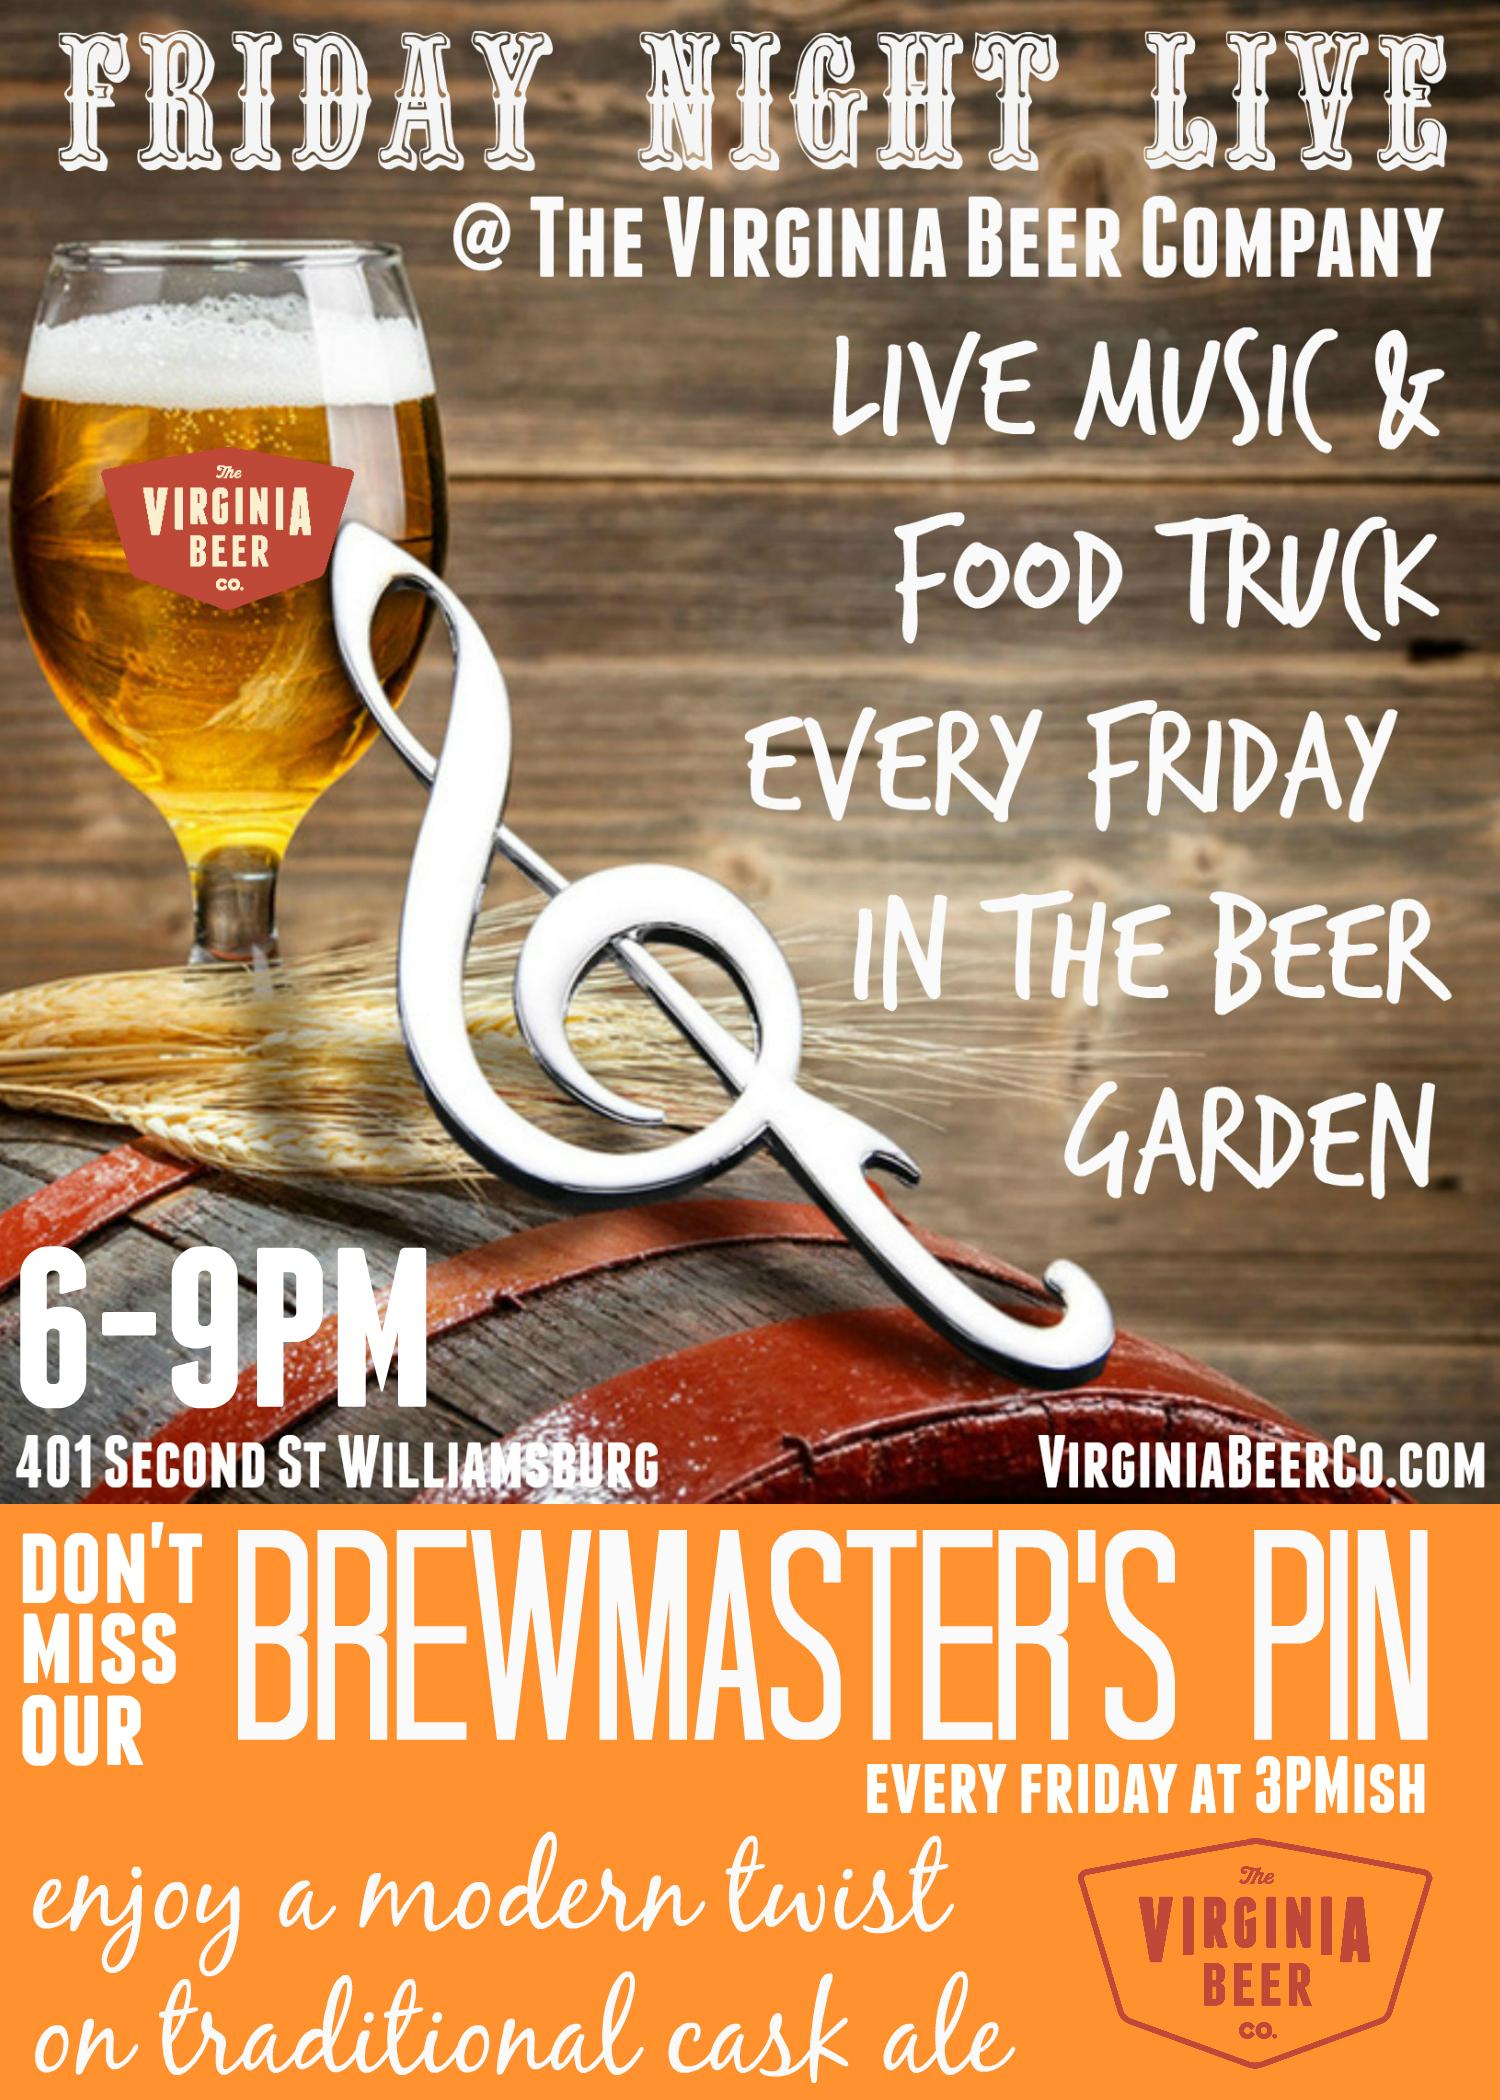 VBC VA craft beer month 5x7 postcard side 2.jpg